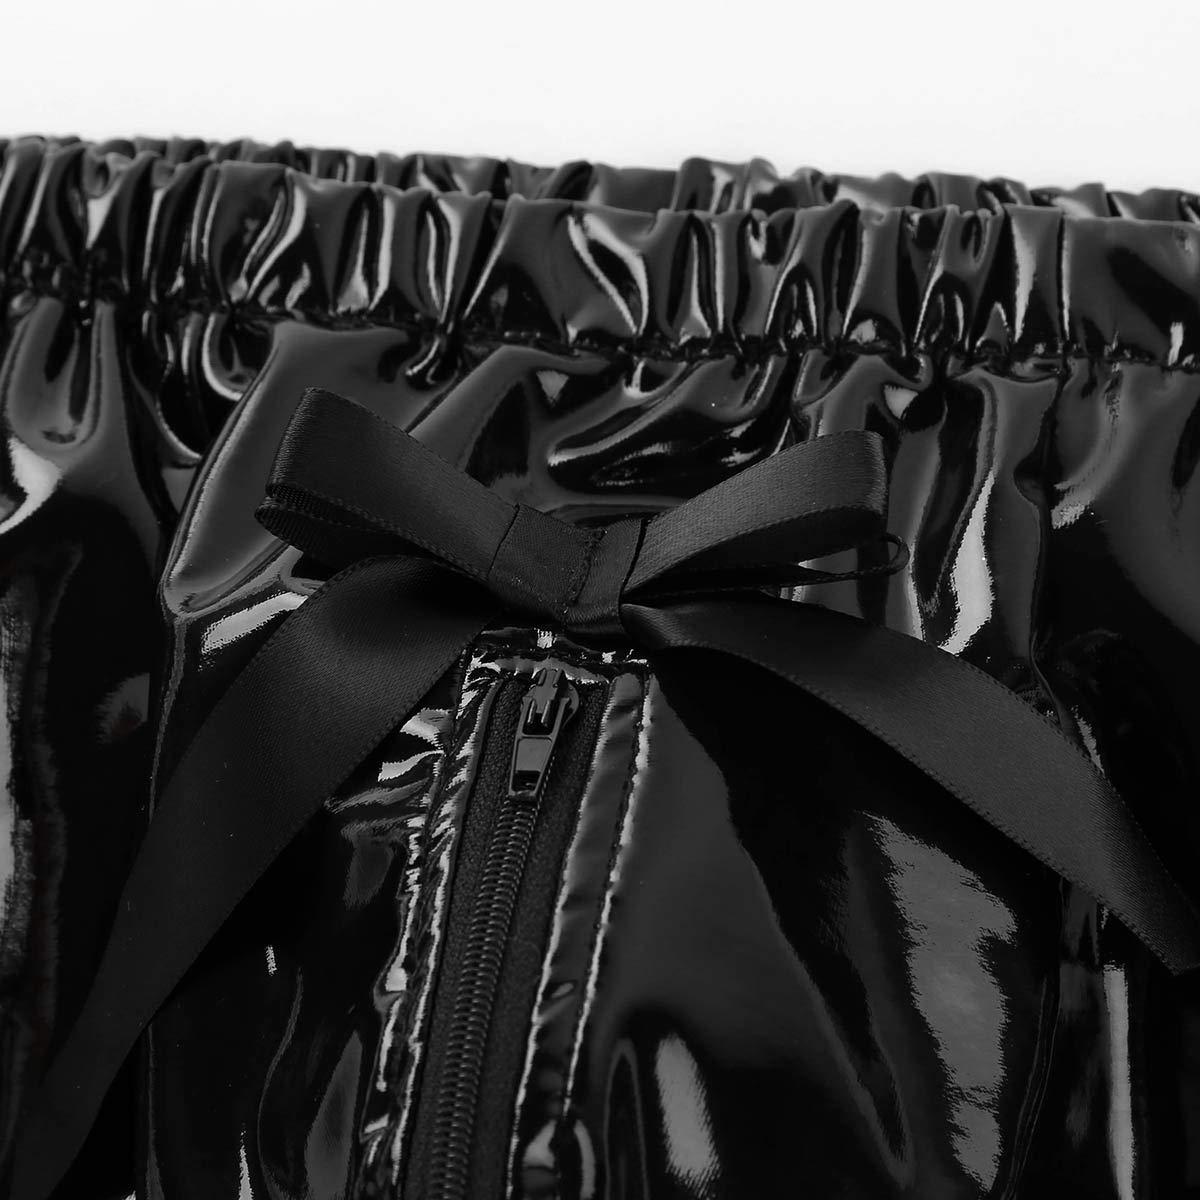 Alvivi Mens Wet Look Boxer Briefs Zippered Bulge Pouch Underwear Ruffled Panties Skirted Bottom